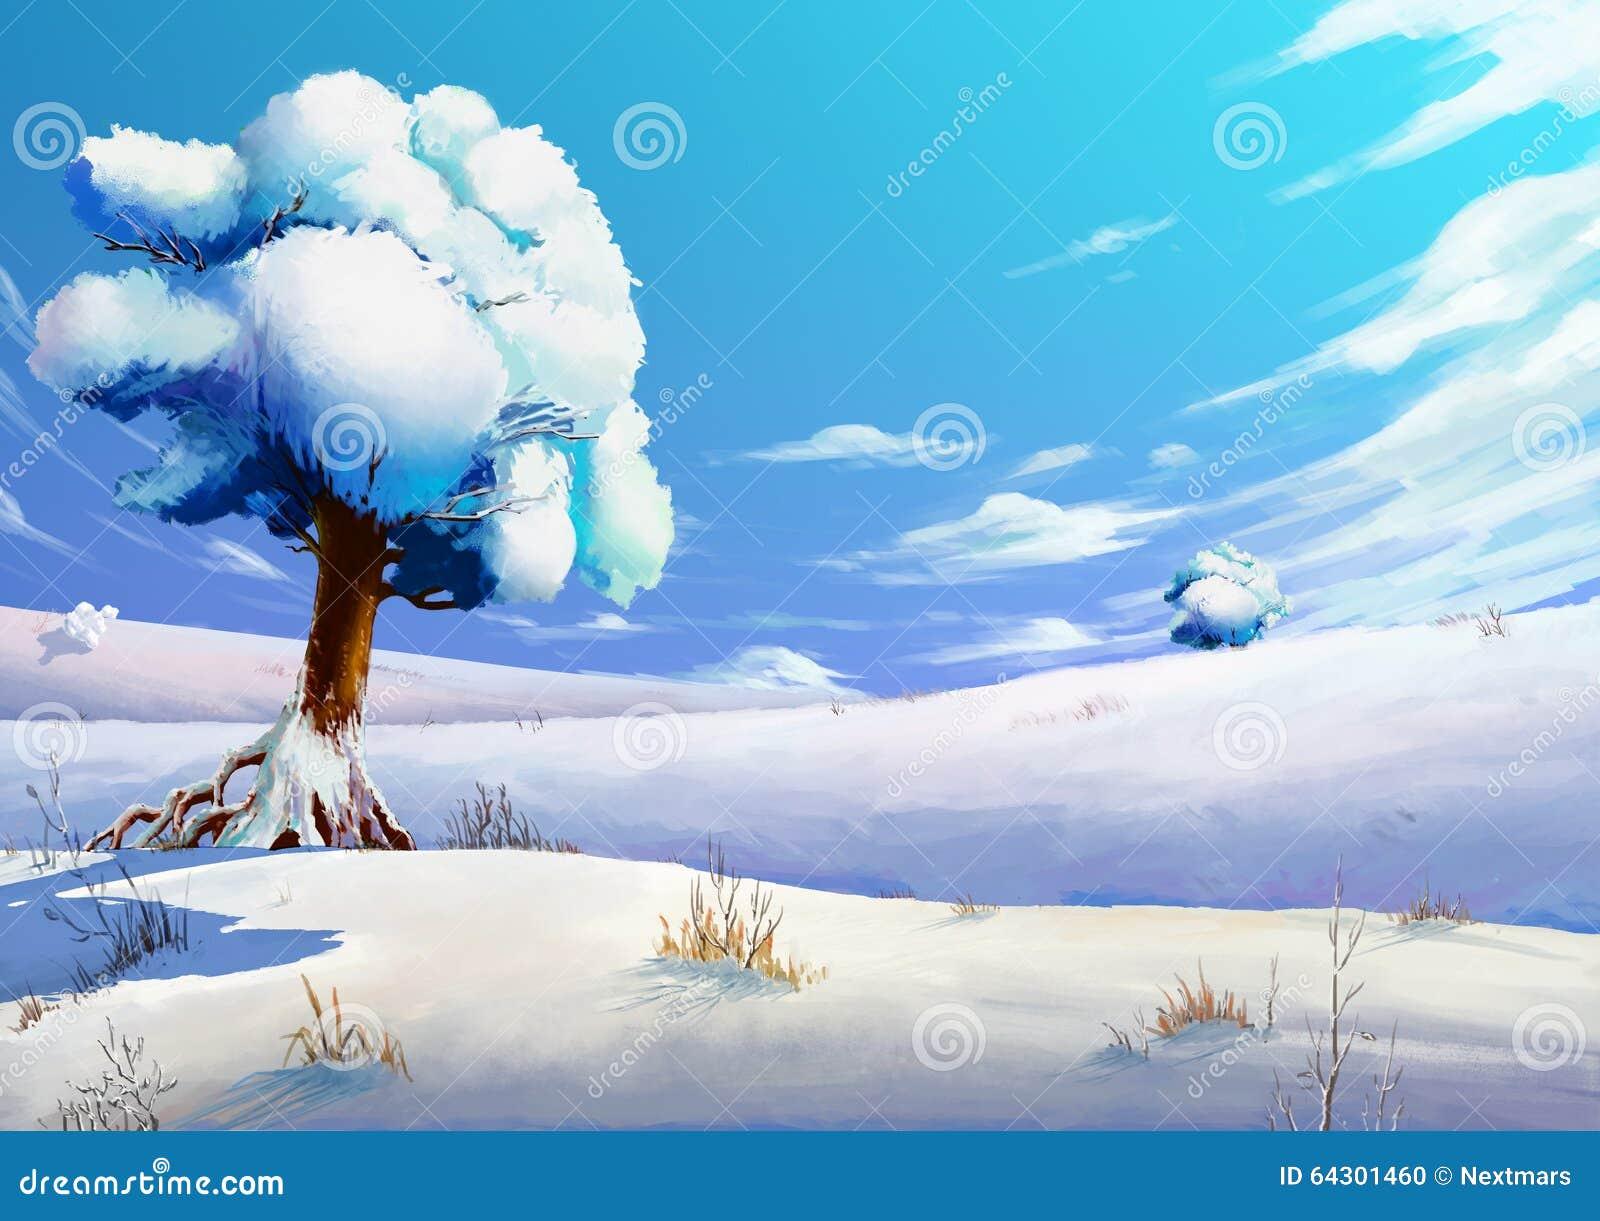 Illustration The Winter Snow Field Stock Illustration